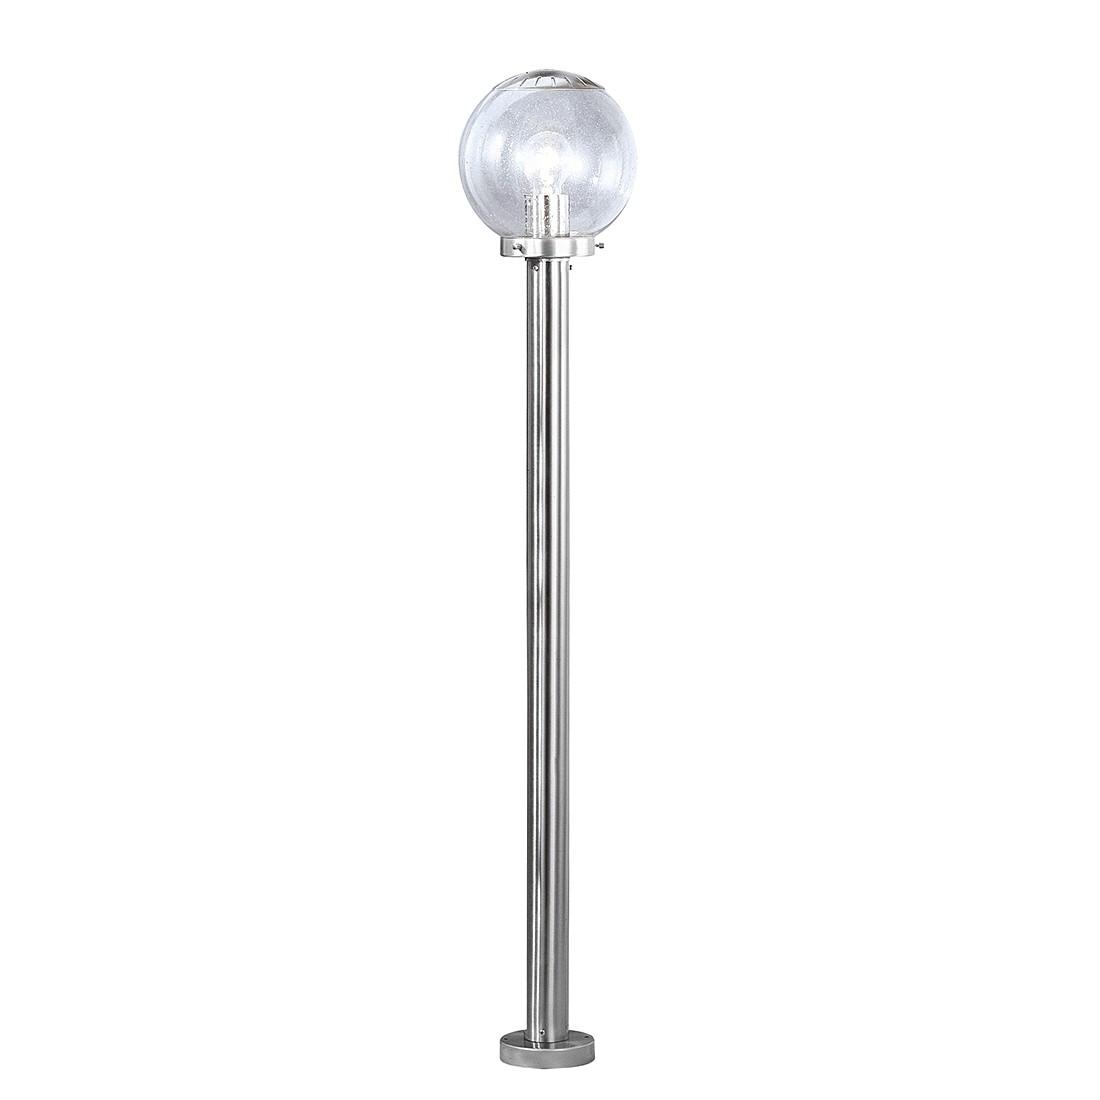 EEK A++, Außenlampe Bowle V - 1-flammig, Globo Lighting